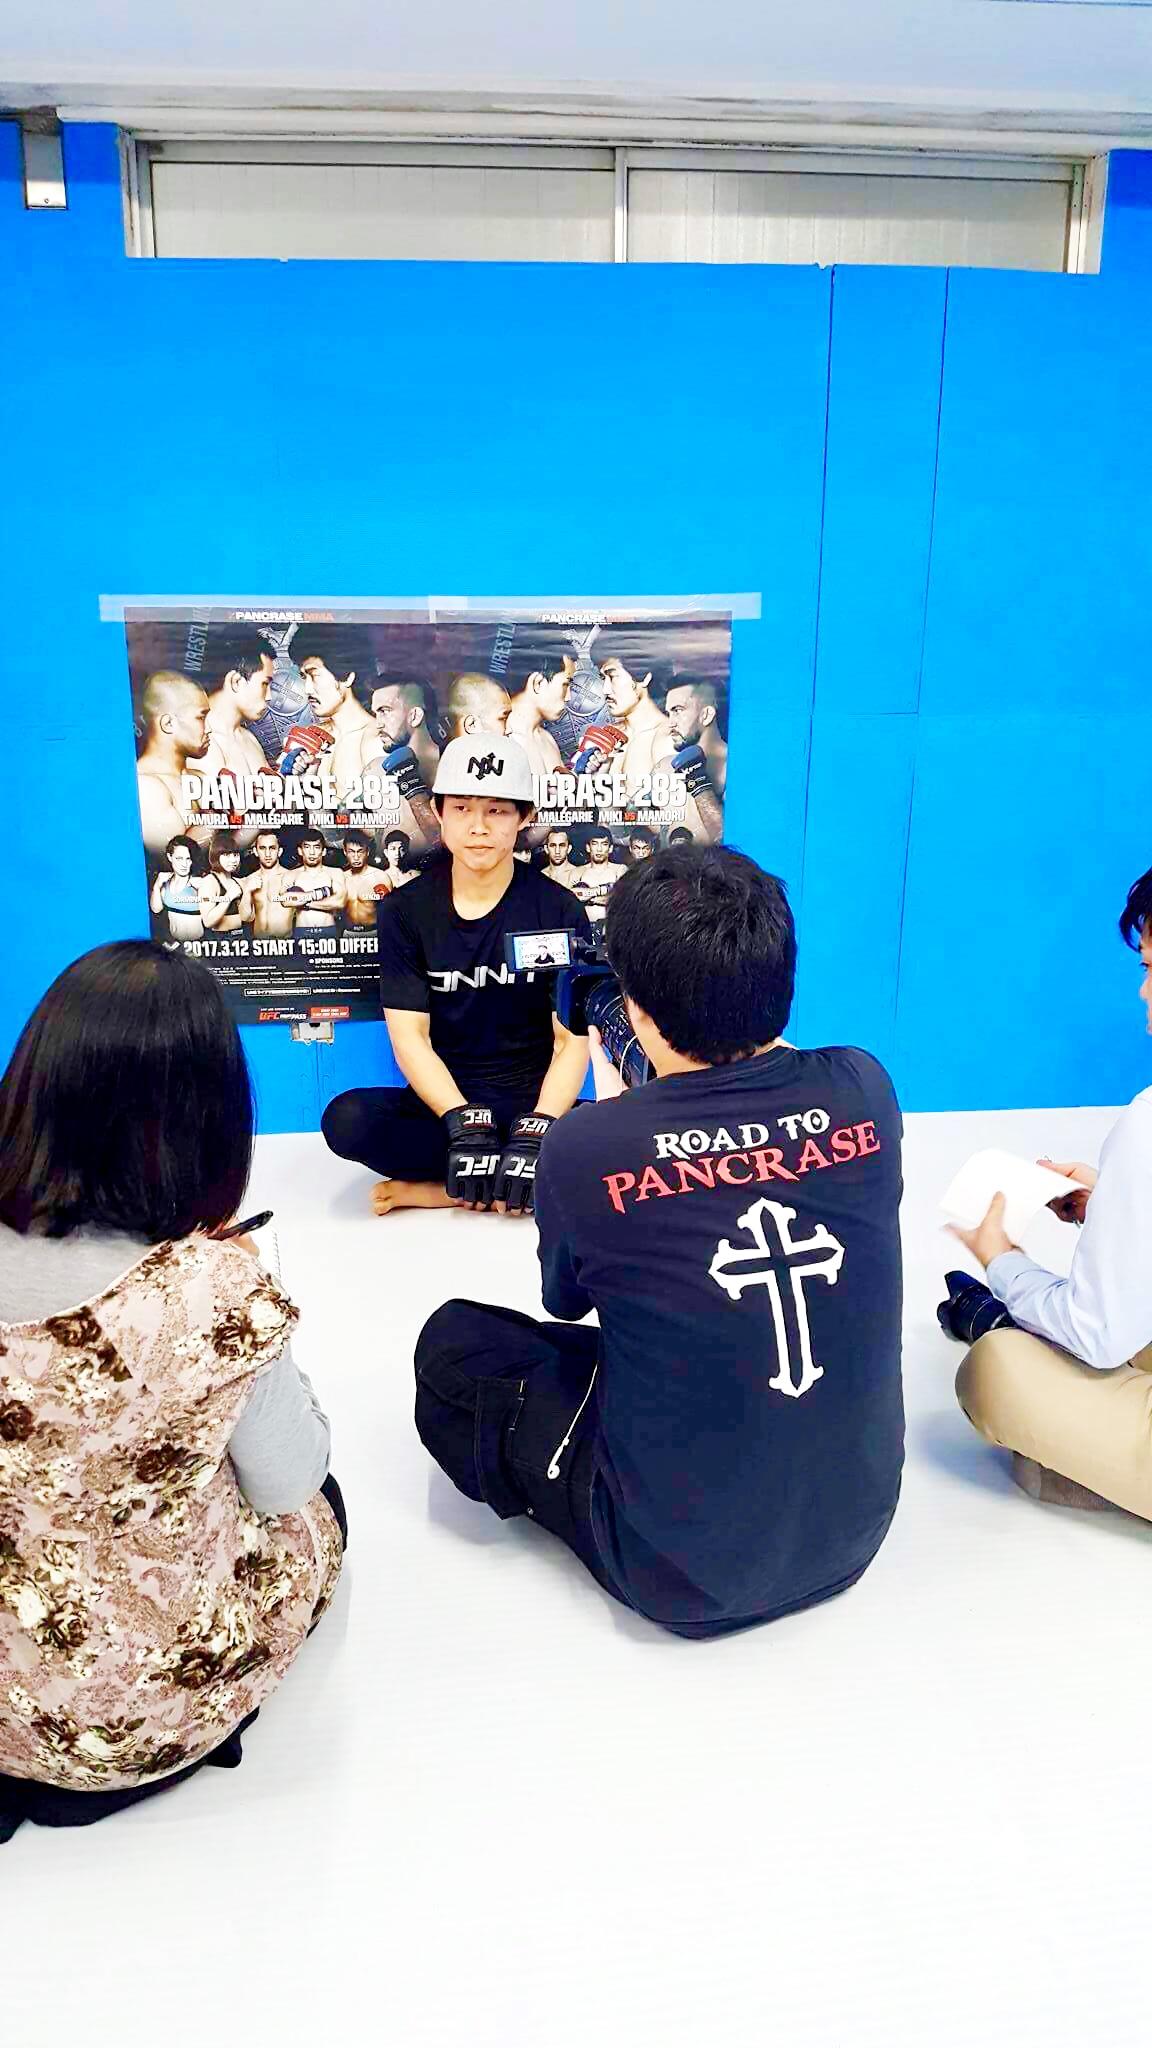 interview-pancrase285